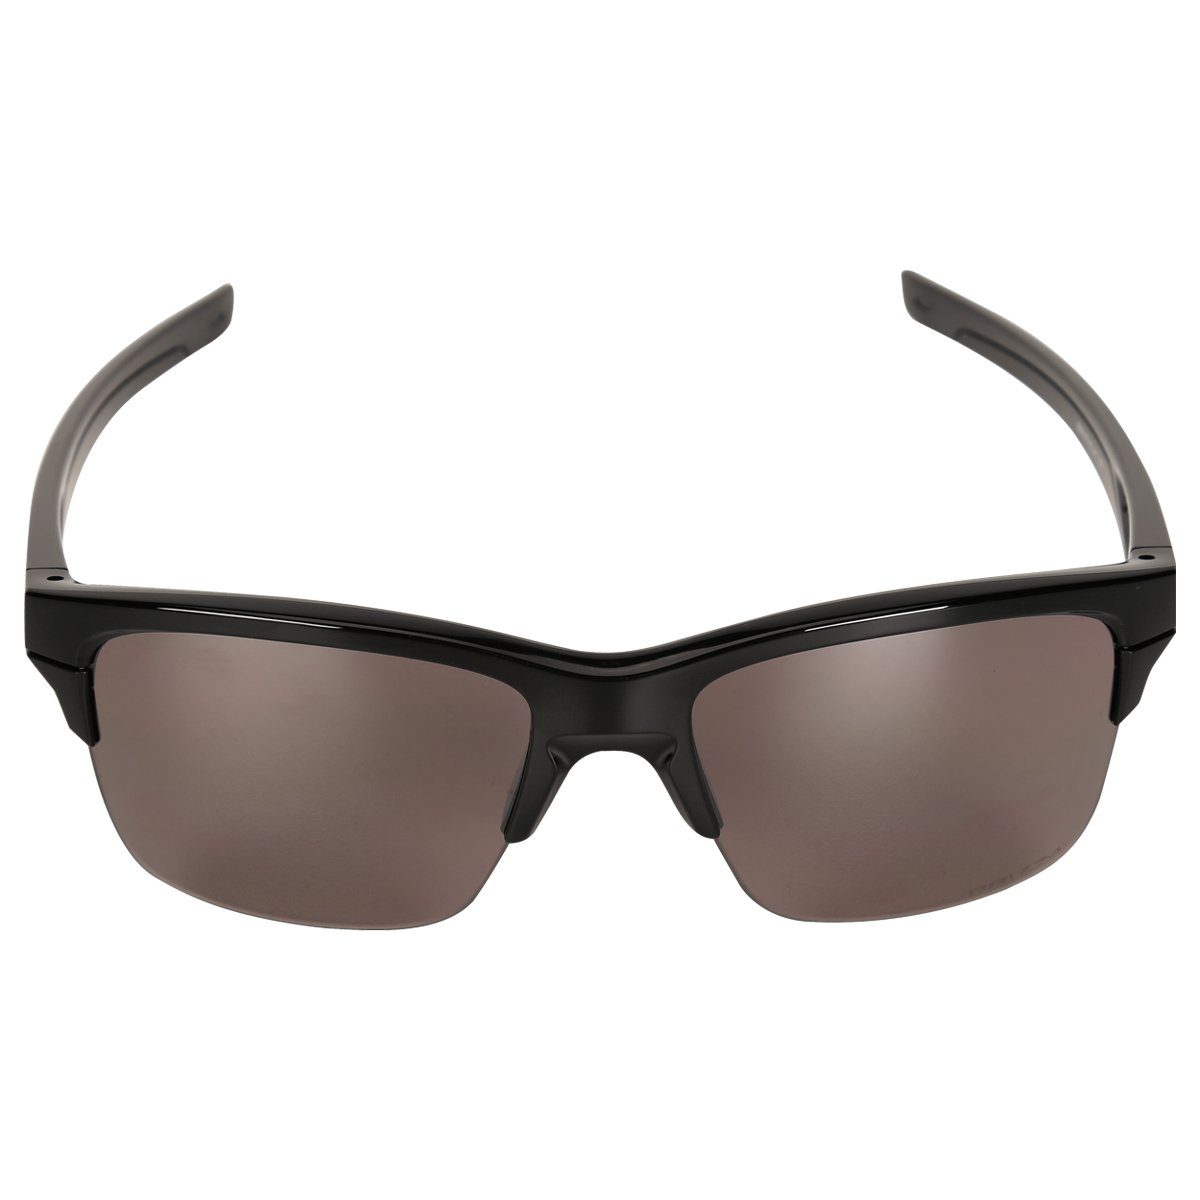 Óculos Oakley Thinlink-Prizm Daily Polarized - Compre Agora   Netshoes ec11a02570